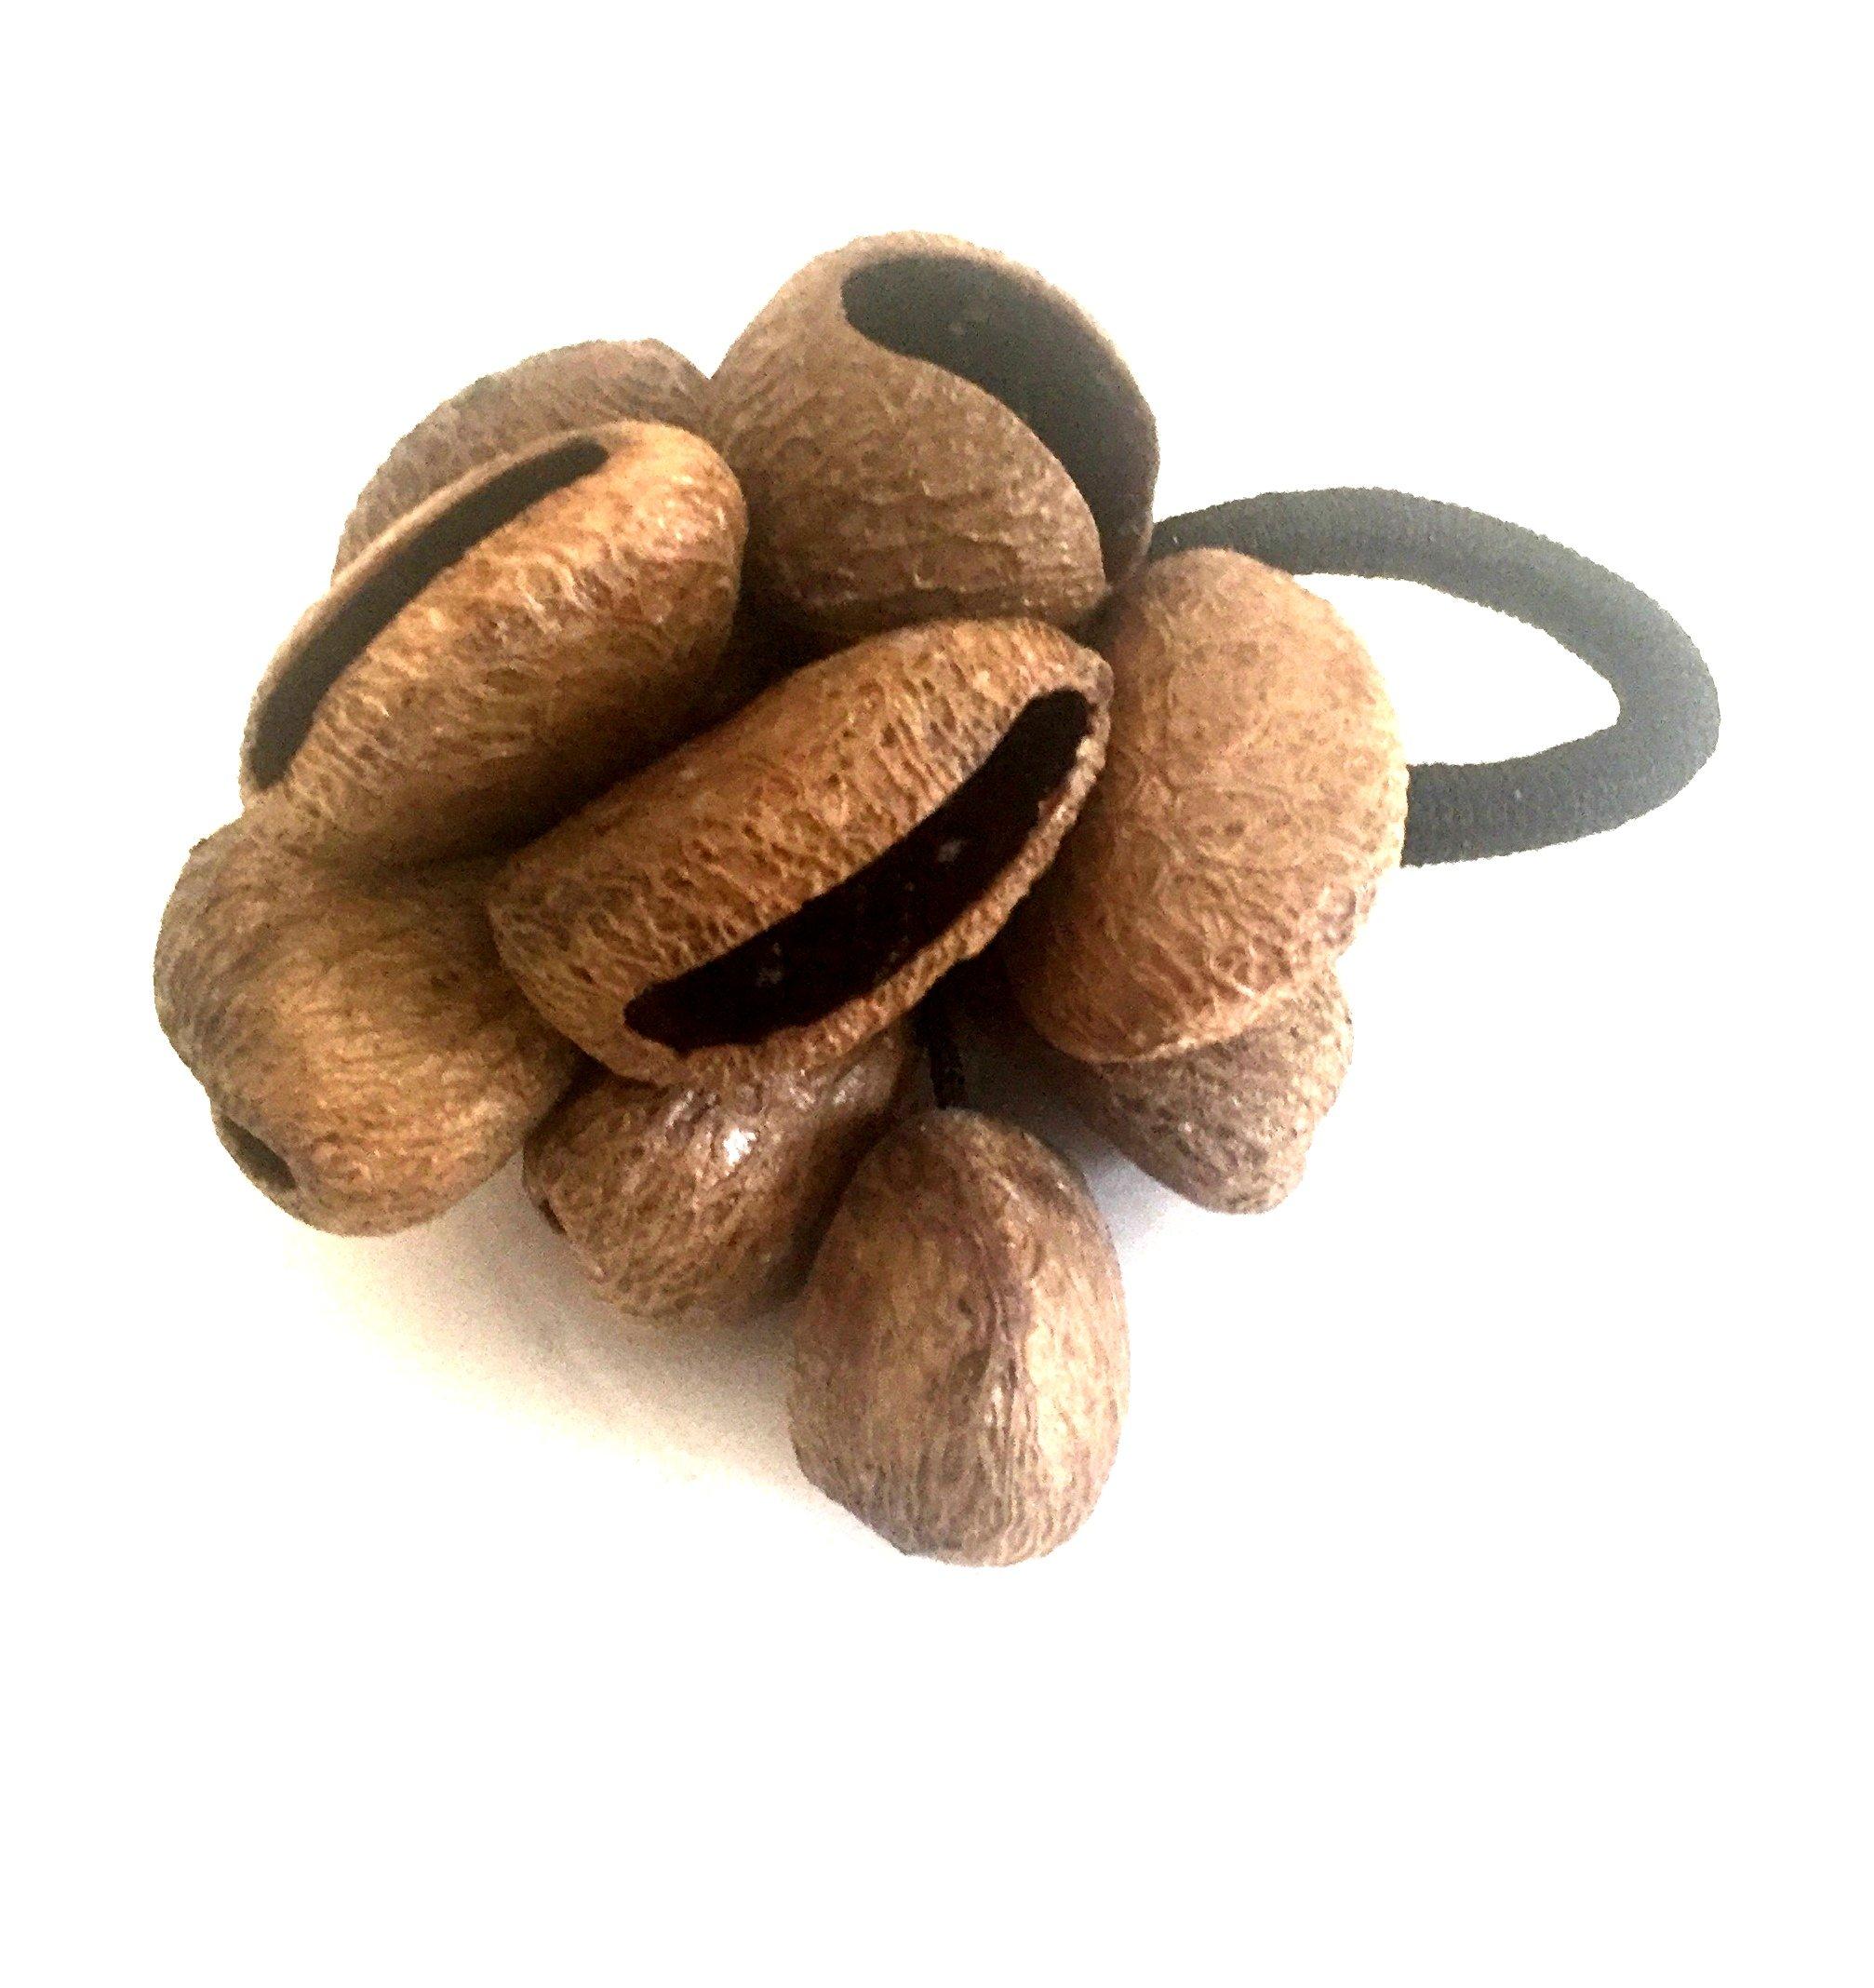 Maracas Chestnut Seed Sacred Rattle Shaker Percussion Instrument - JIVE BRAND